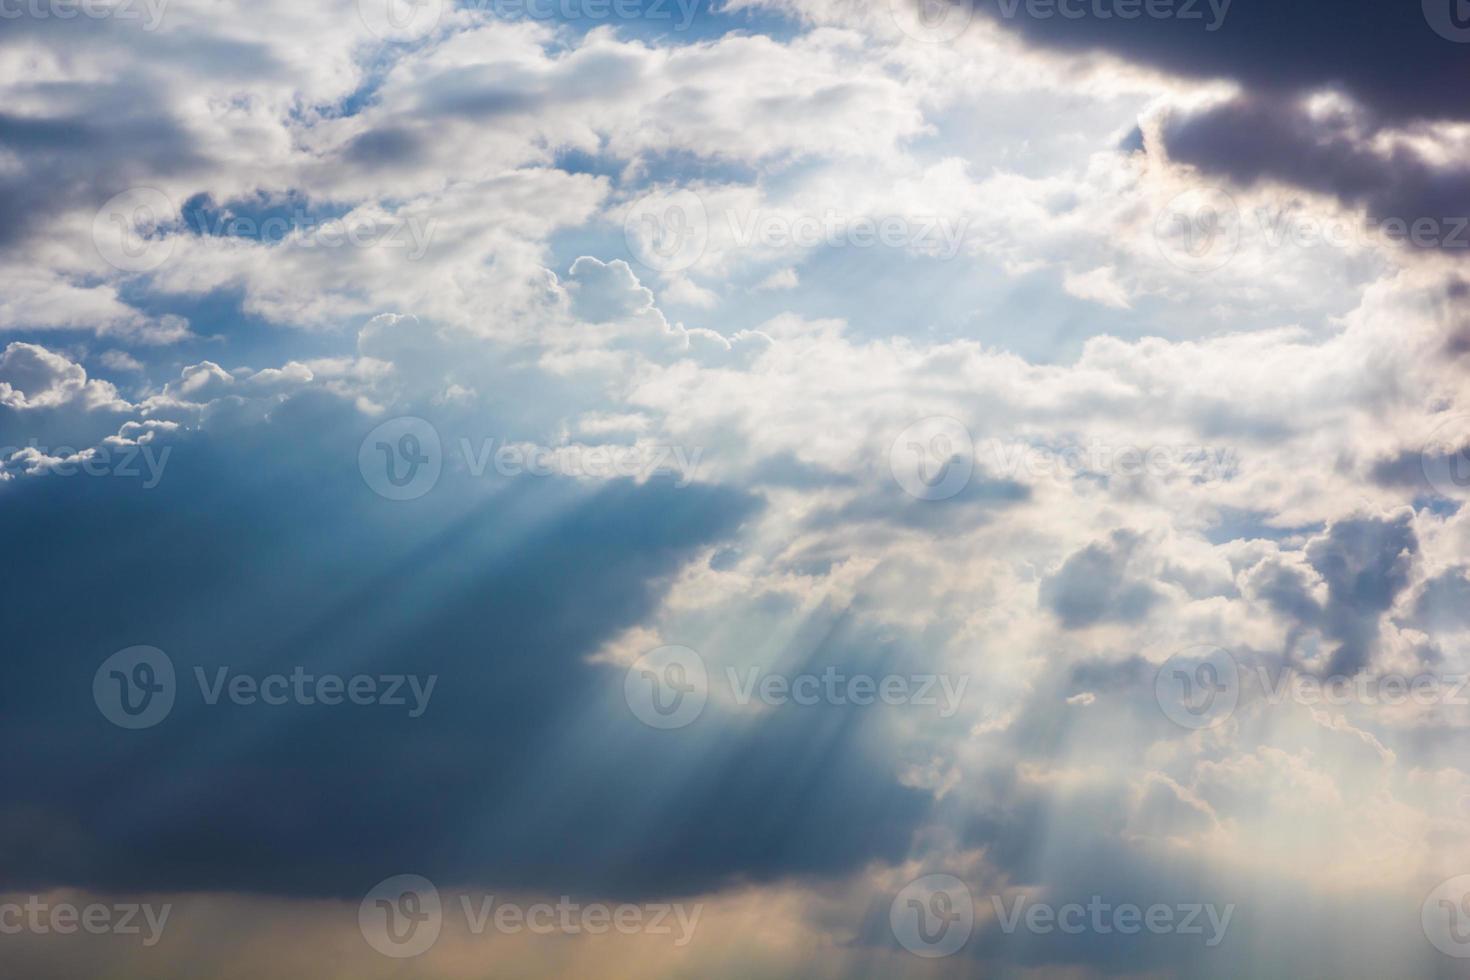 Sonnenstrahl durch Dunst am Himmel foto